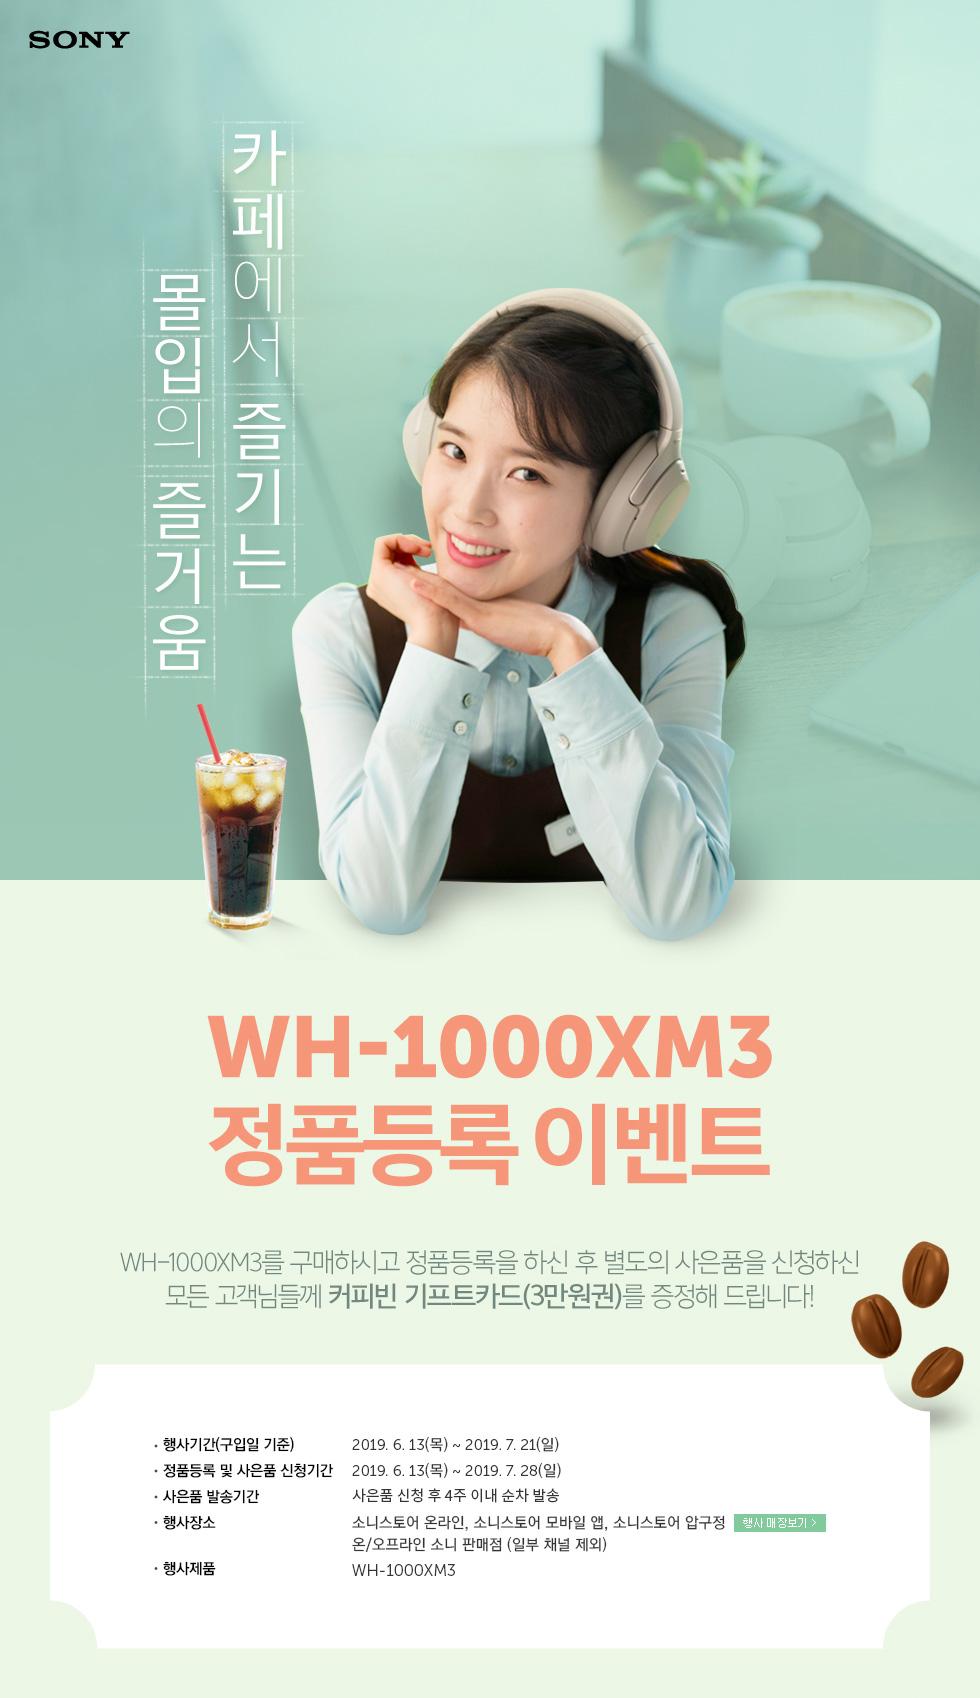 WH-1000XM3 정품등록 이벤트